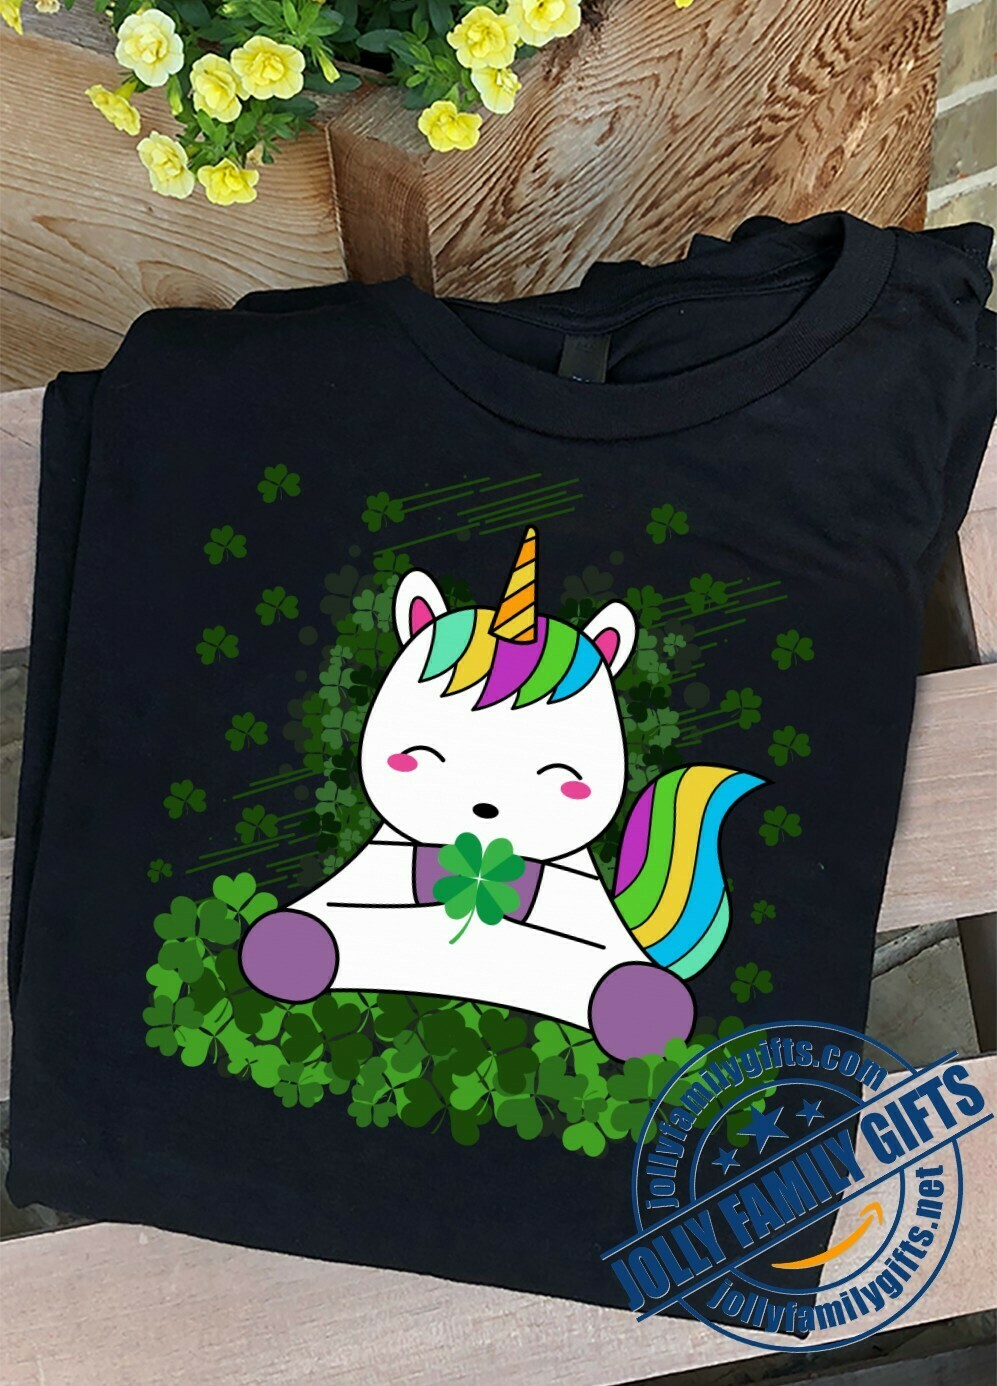 I am Magically Delicious Unicorn St Patrick's Day Irish Shamrock Horse Breed Leprechaun spirit animal  T-Shirt Hoodie Sweatshirt Sweater Tee Kids Youth Gifts Jolly Family Gifts